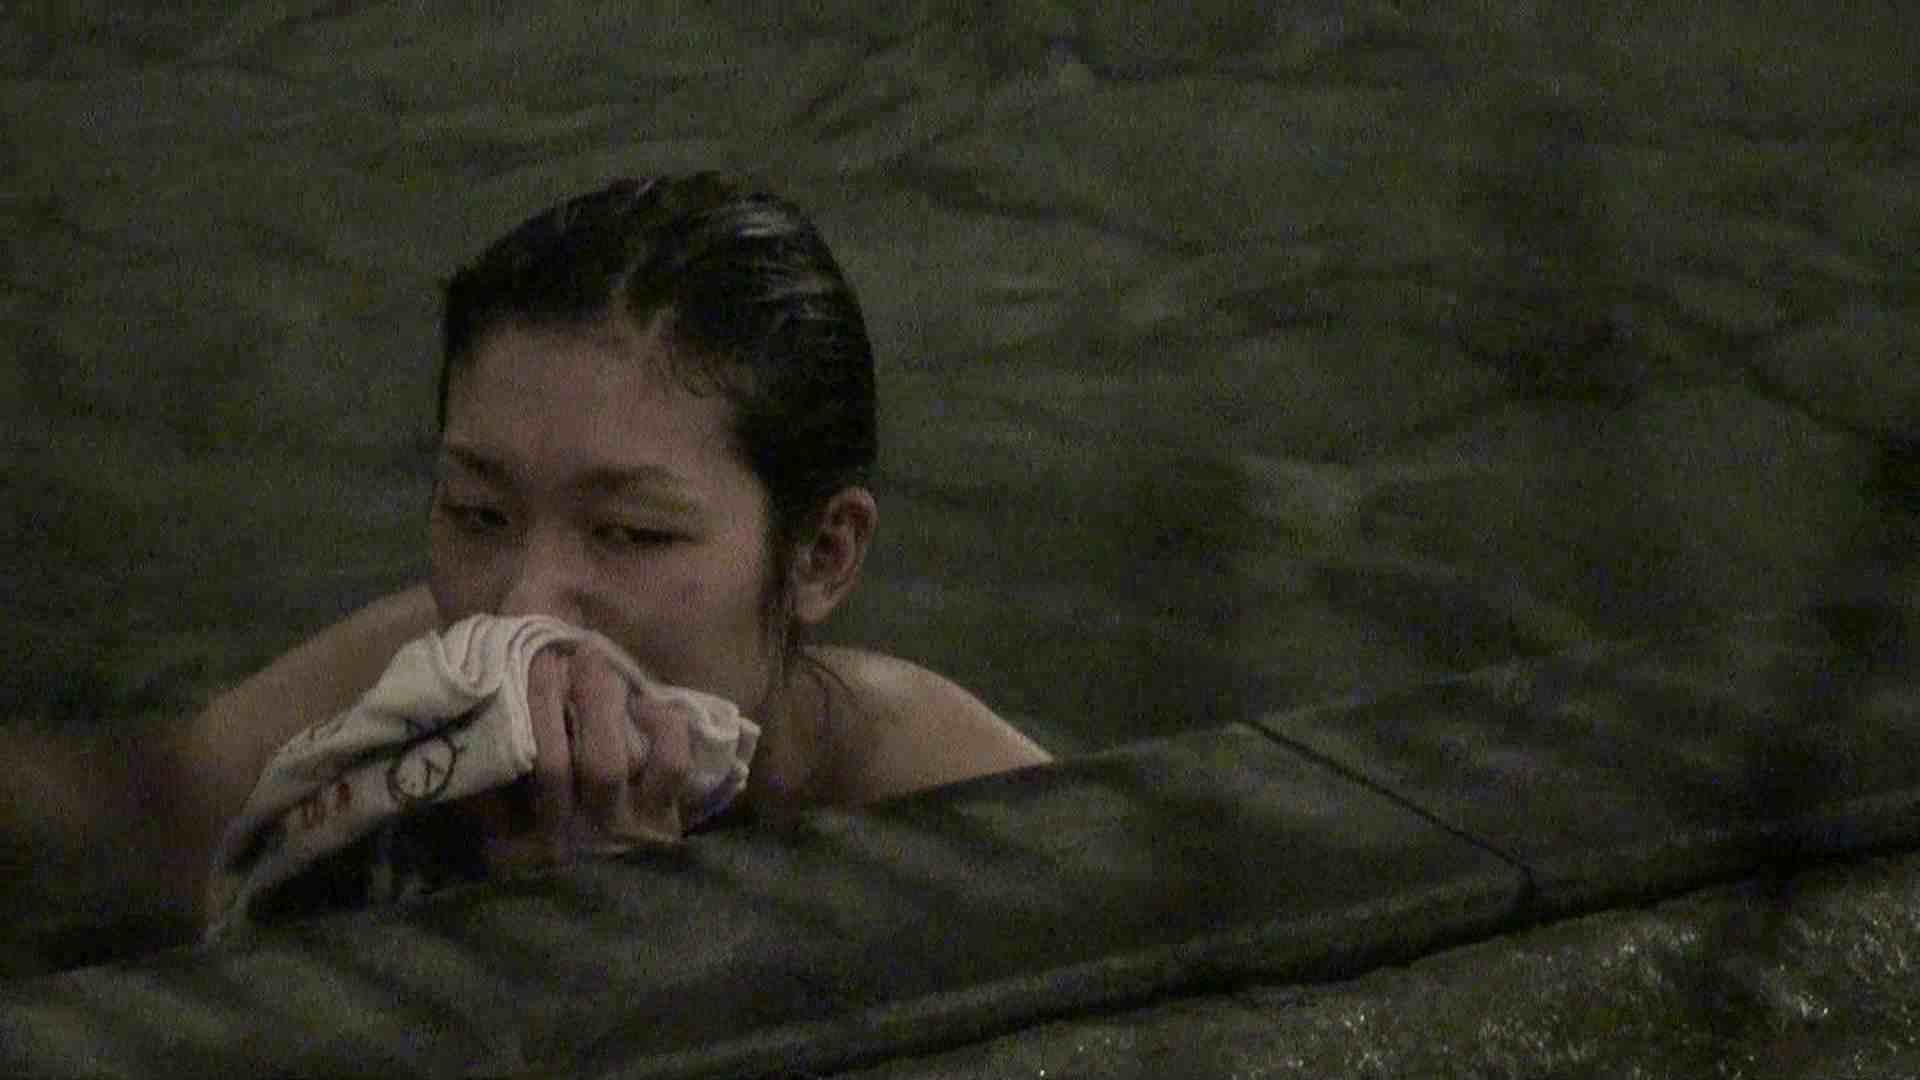 Aquaな露天風呂Vol.399 0   0  81連発 19